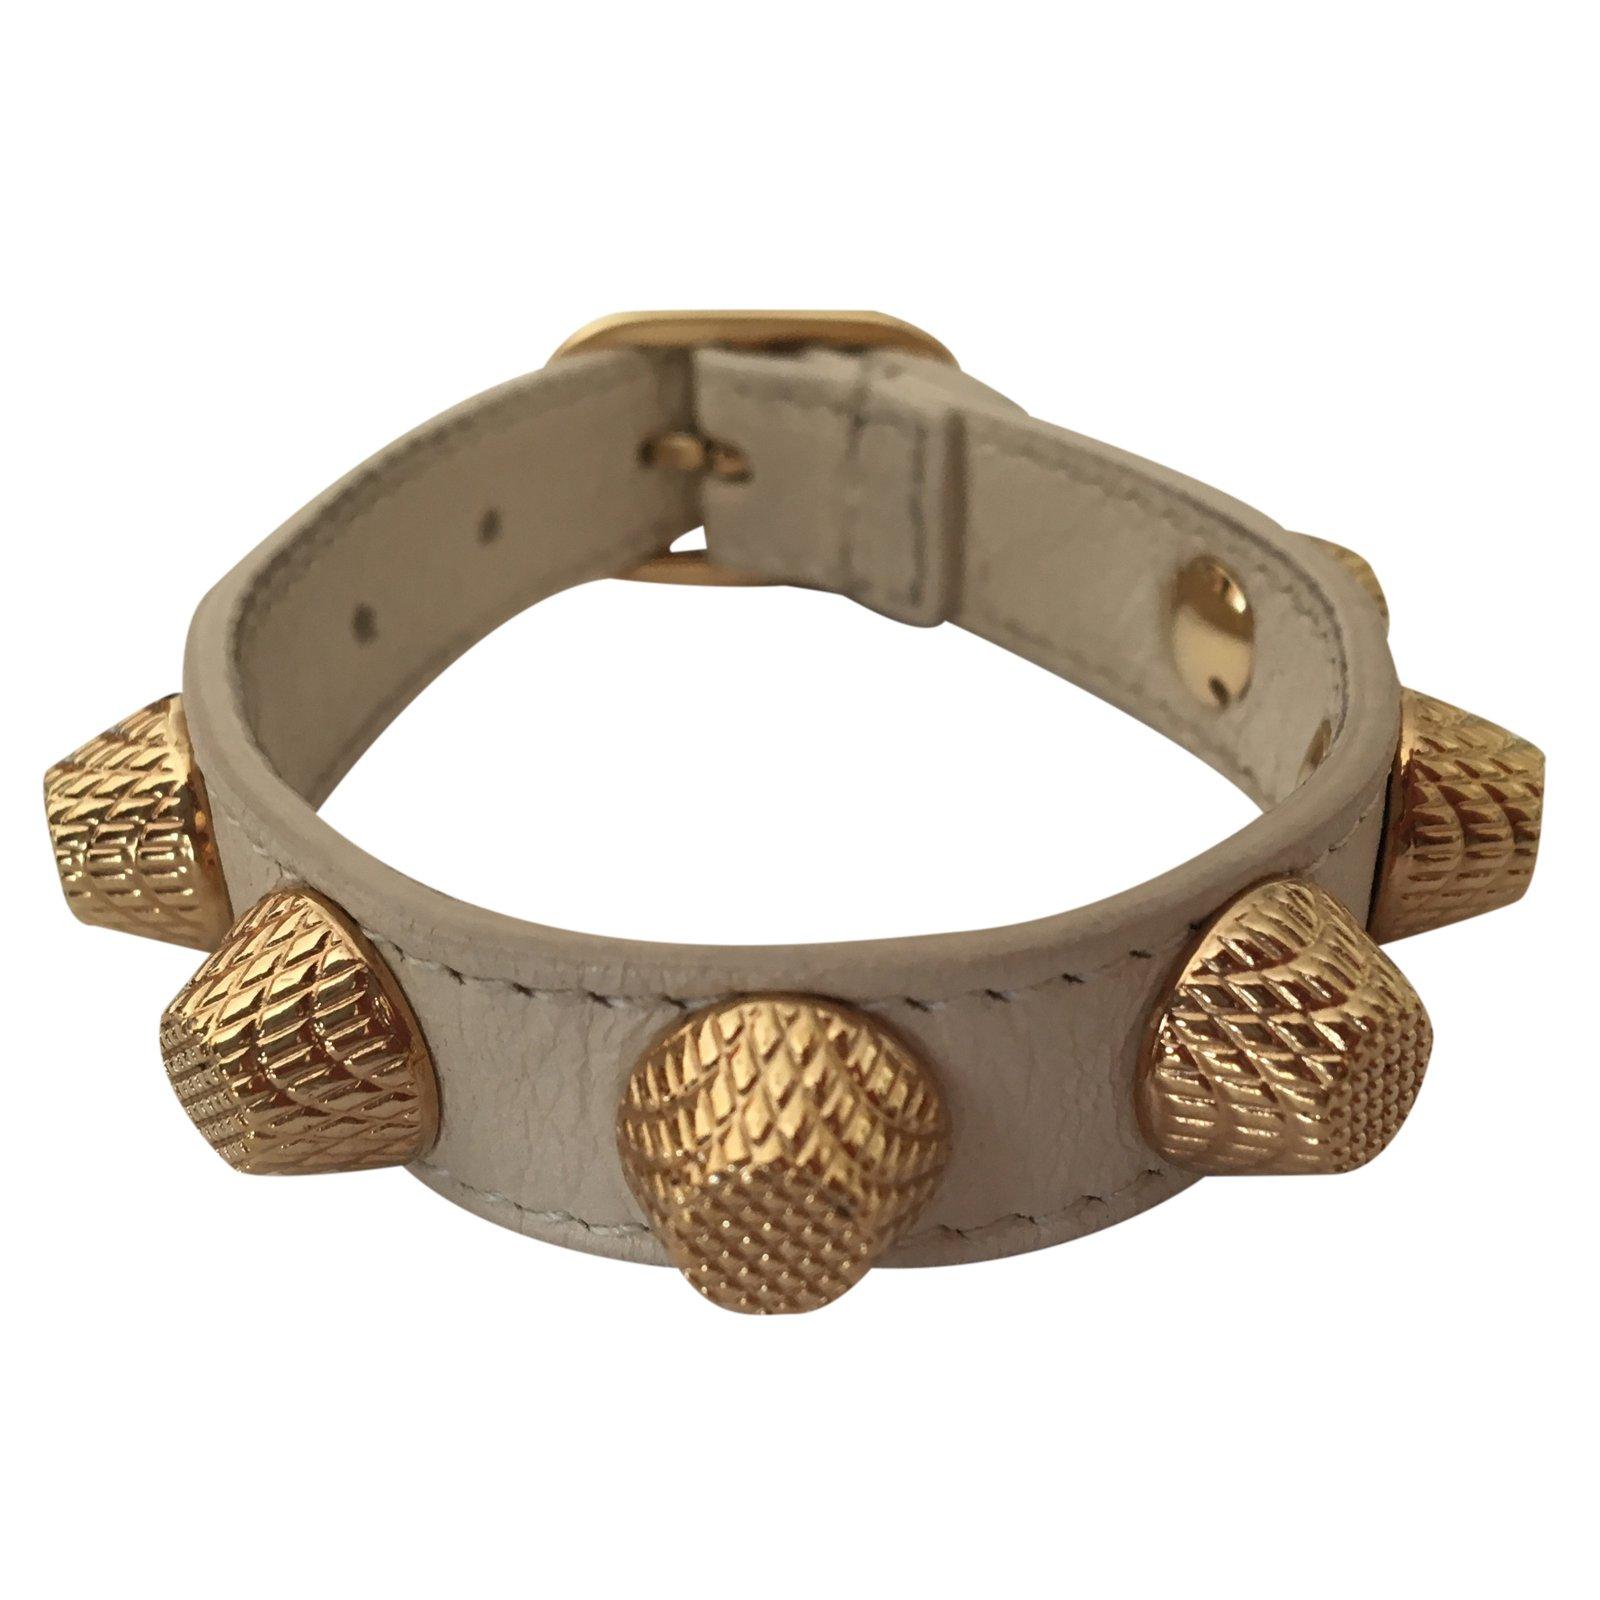 Balenciaga Bracelet Bracelets Leather Beige Ref 24807